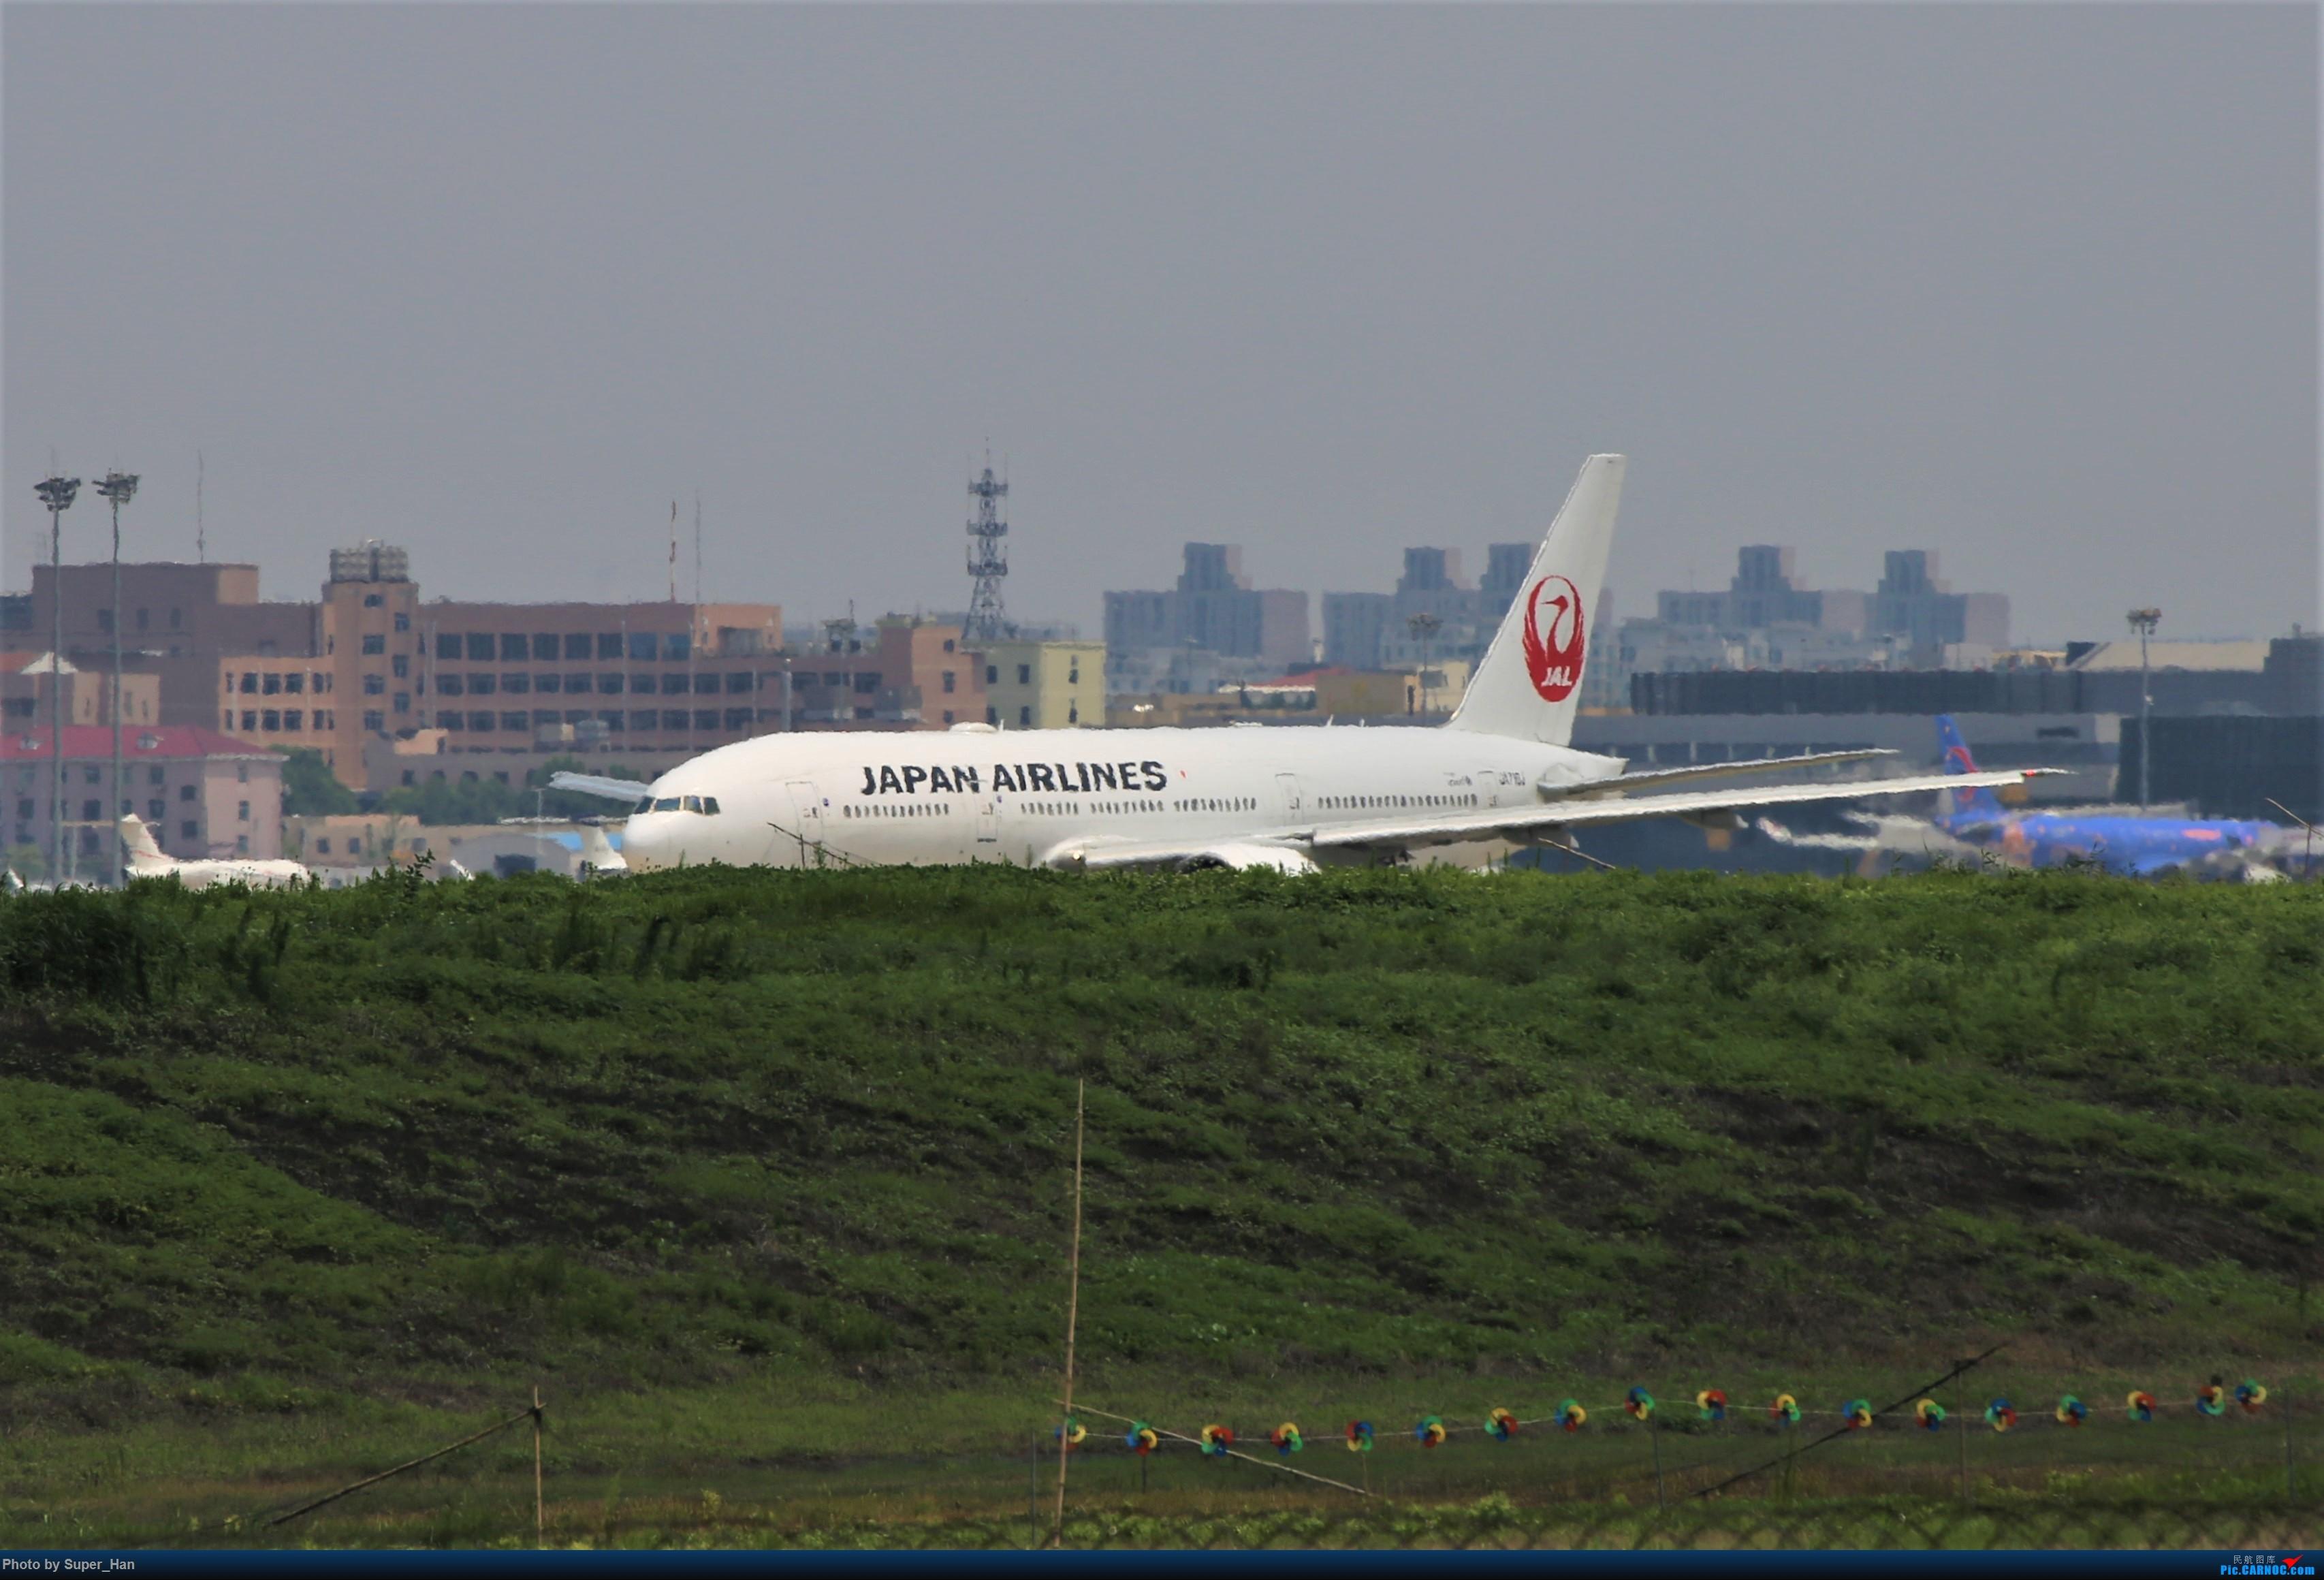 Re:[原创]【杭州飞友会】0715去虹桥说走就走【777篇】 BOEING 777-200ER JA710J 中国上海虹桥国际机场